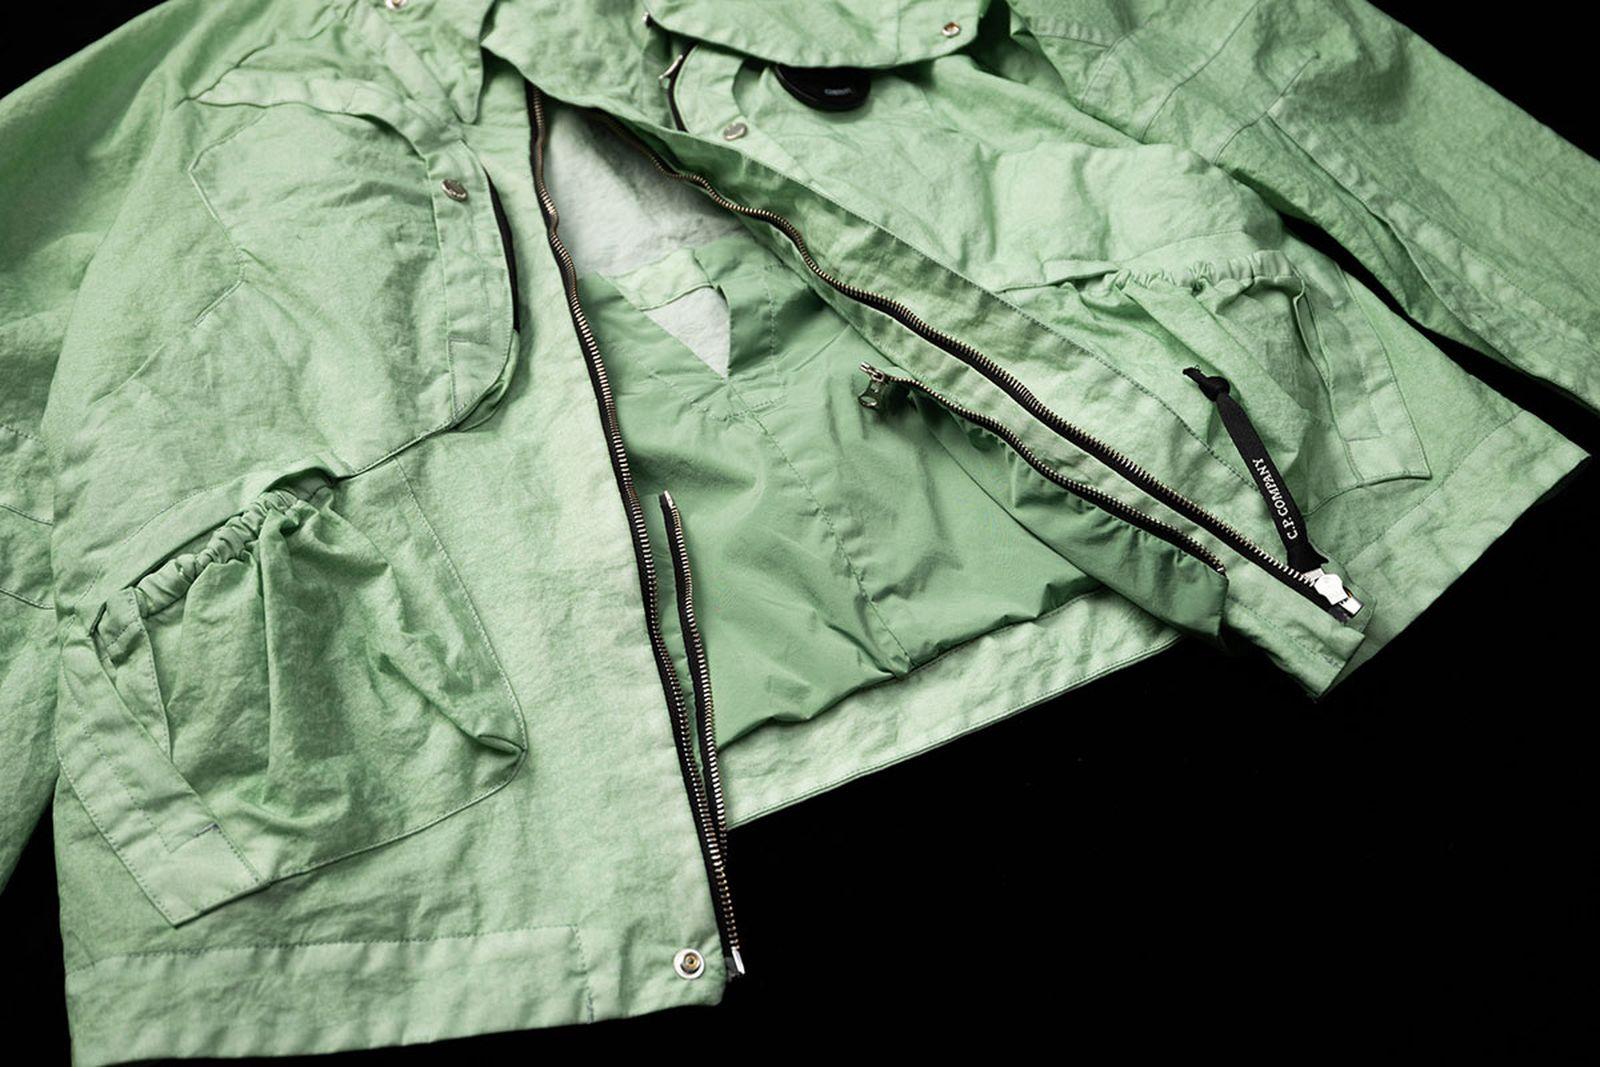 kiko-kosta-cp-company-jacket-details-02